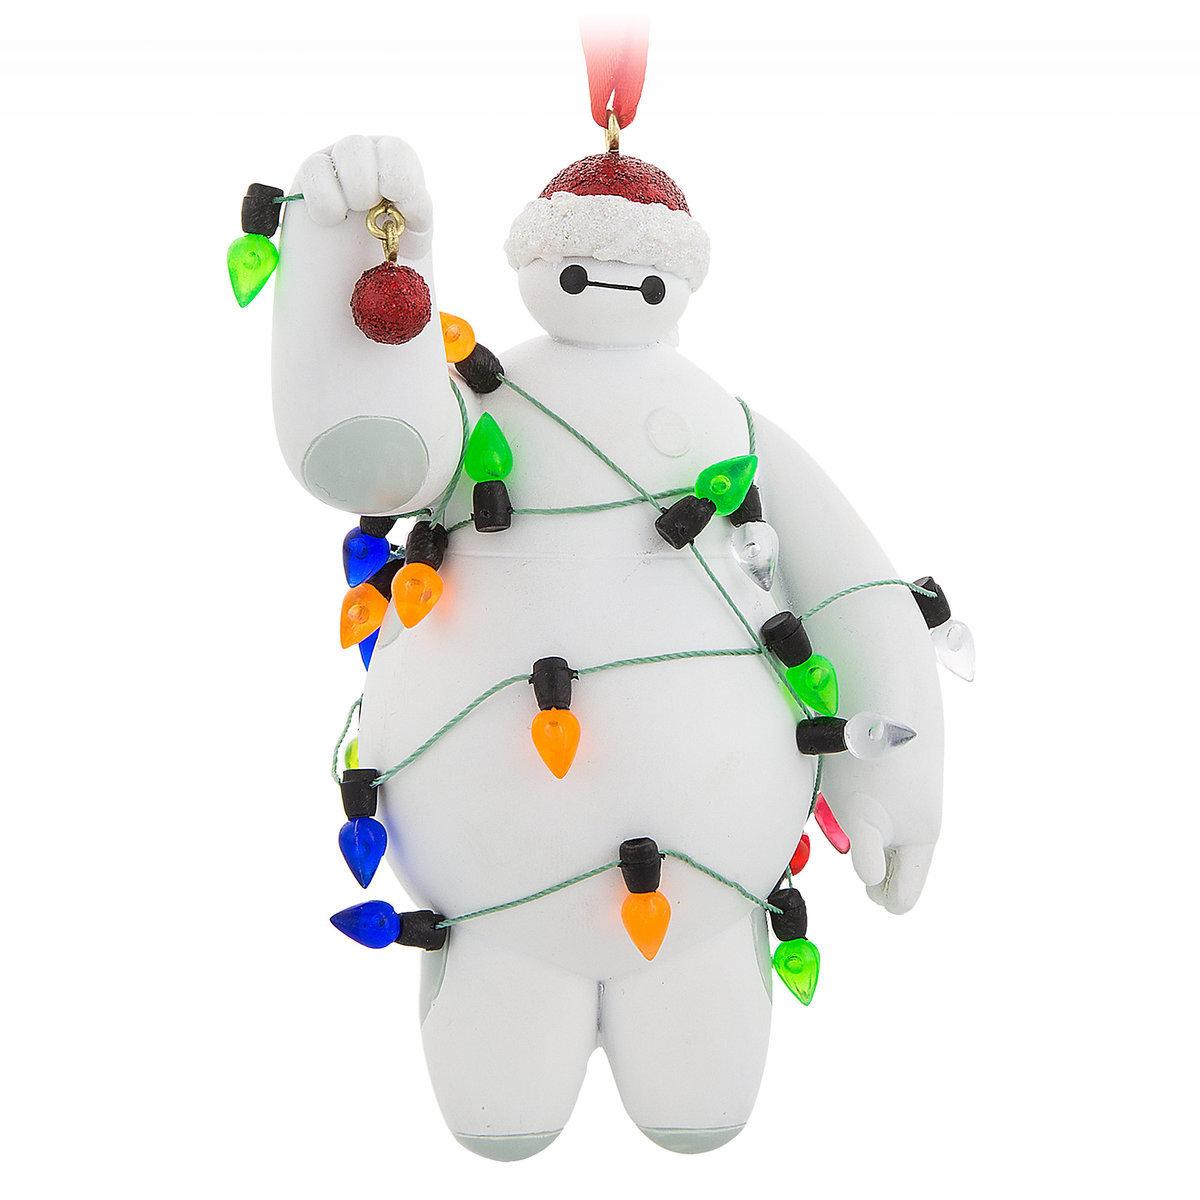 Disney Figurine Ornament Big Hero 6 Baymax In